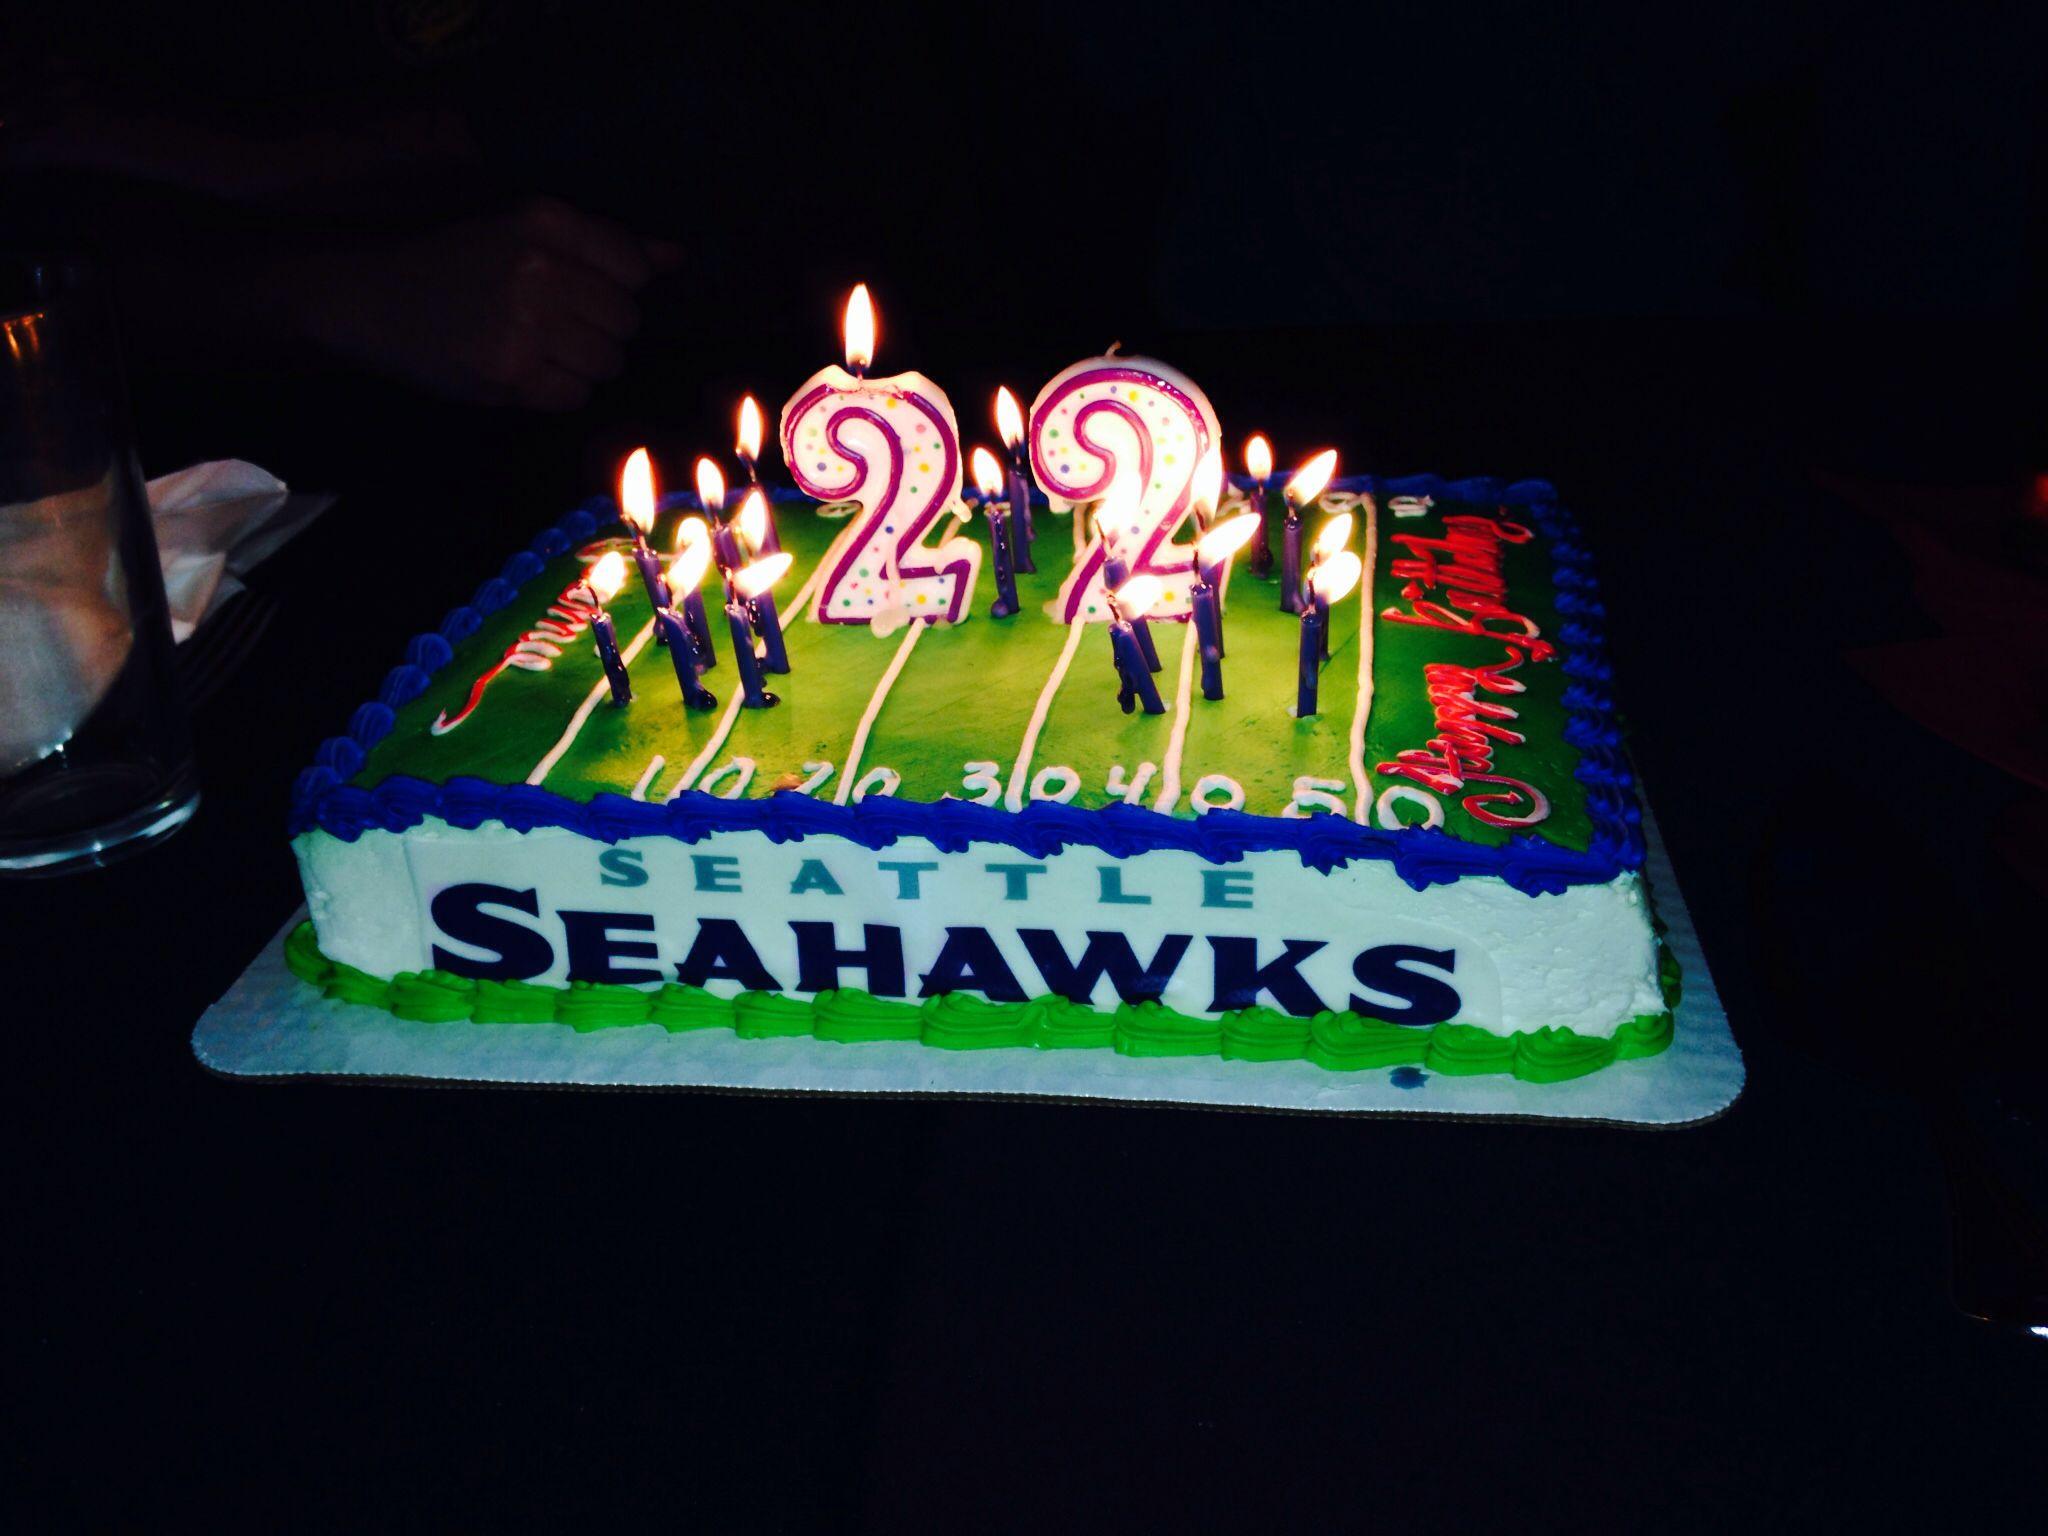 Seahawks birthday cake for my babe(: